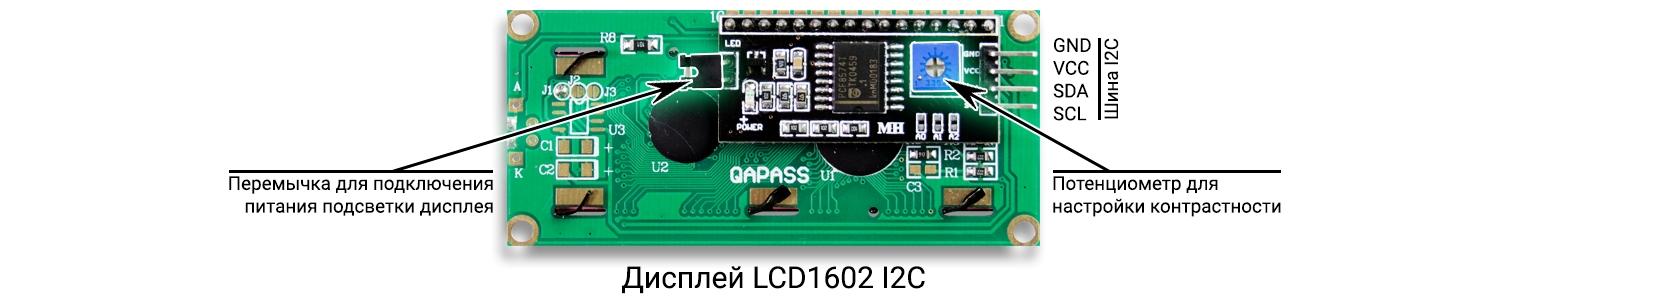 Настройка контрастности дисплея LCD1602